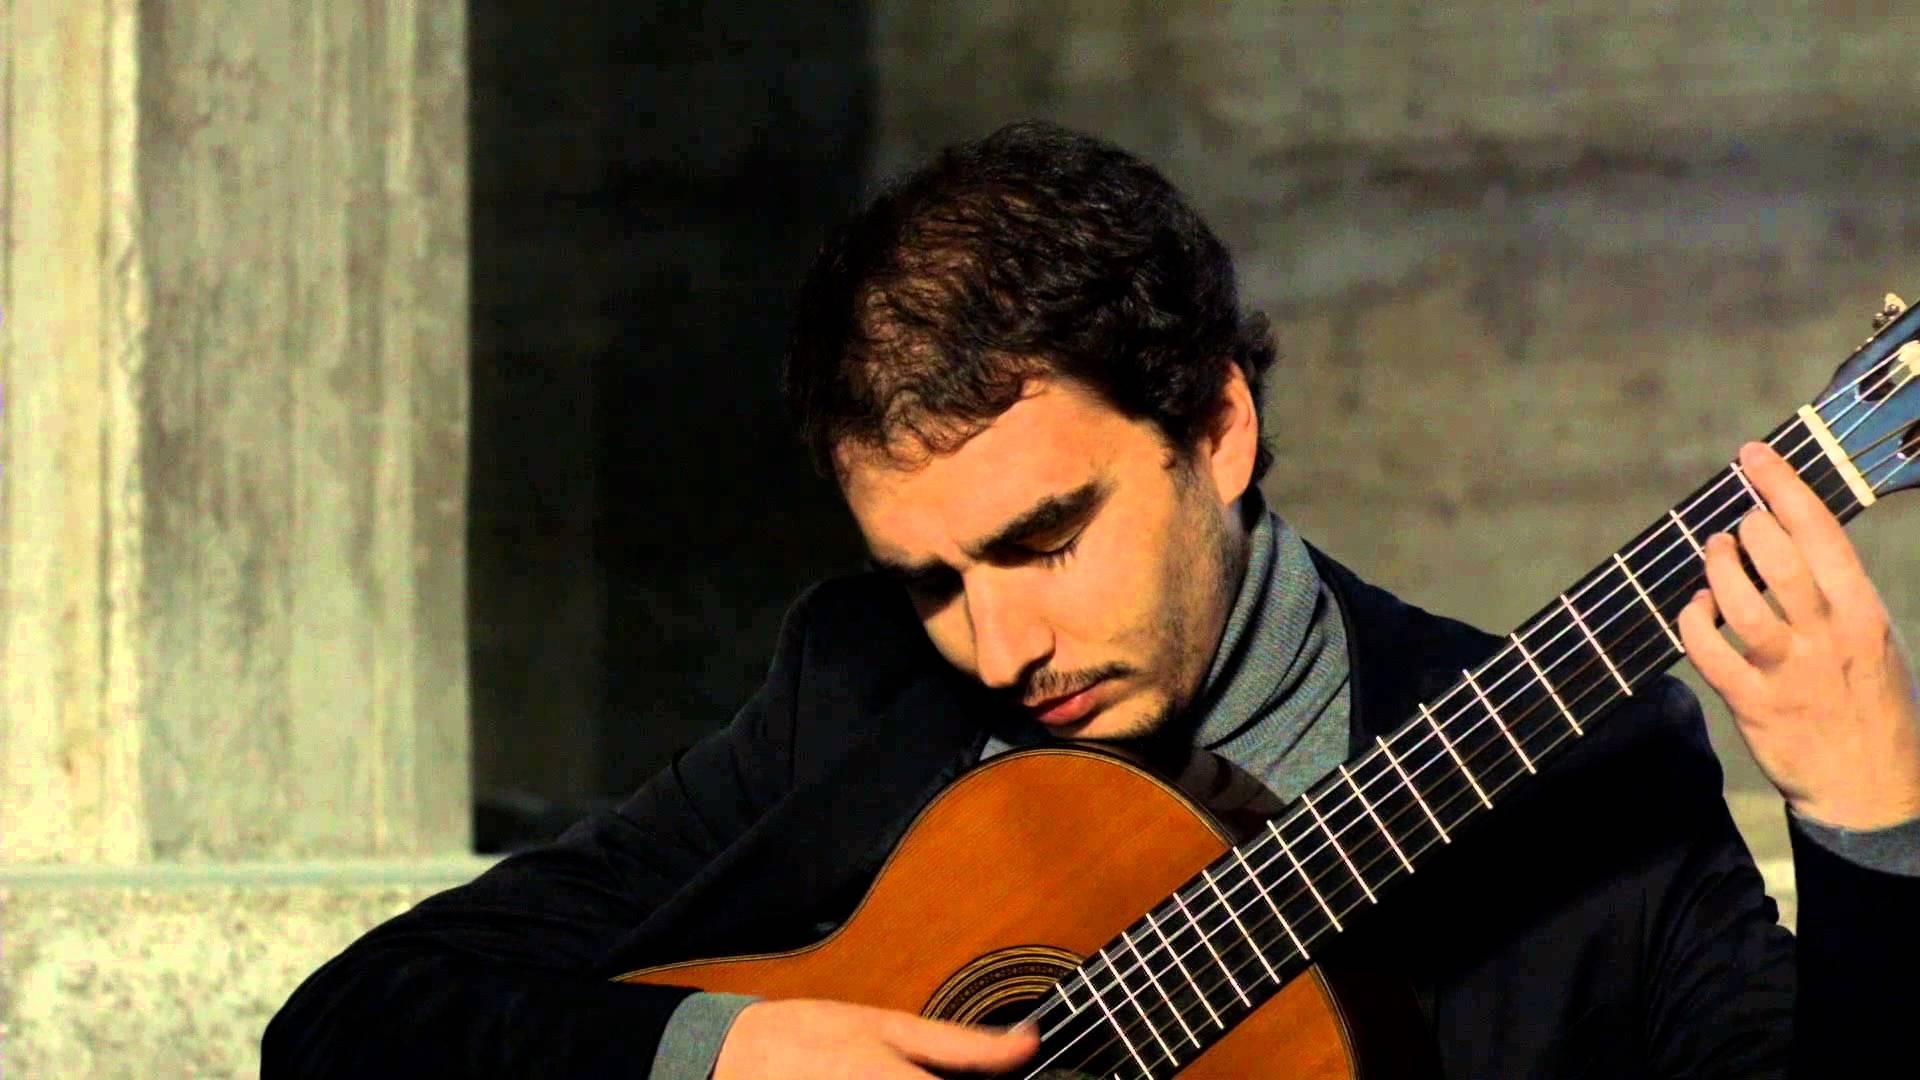 Giacomo Palazzesi